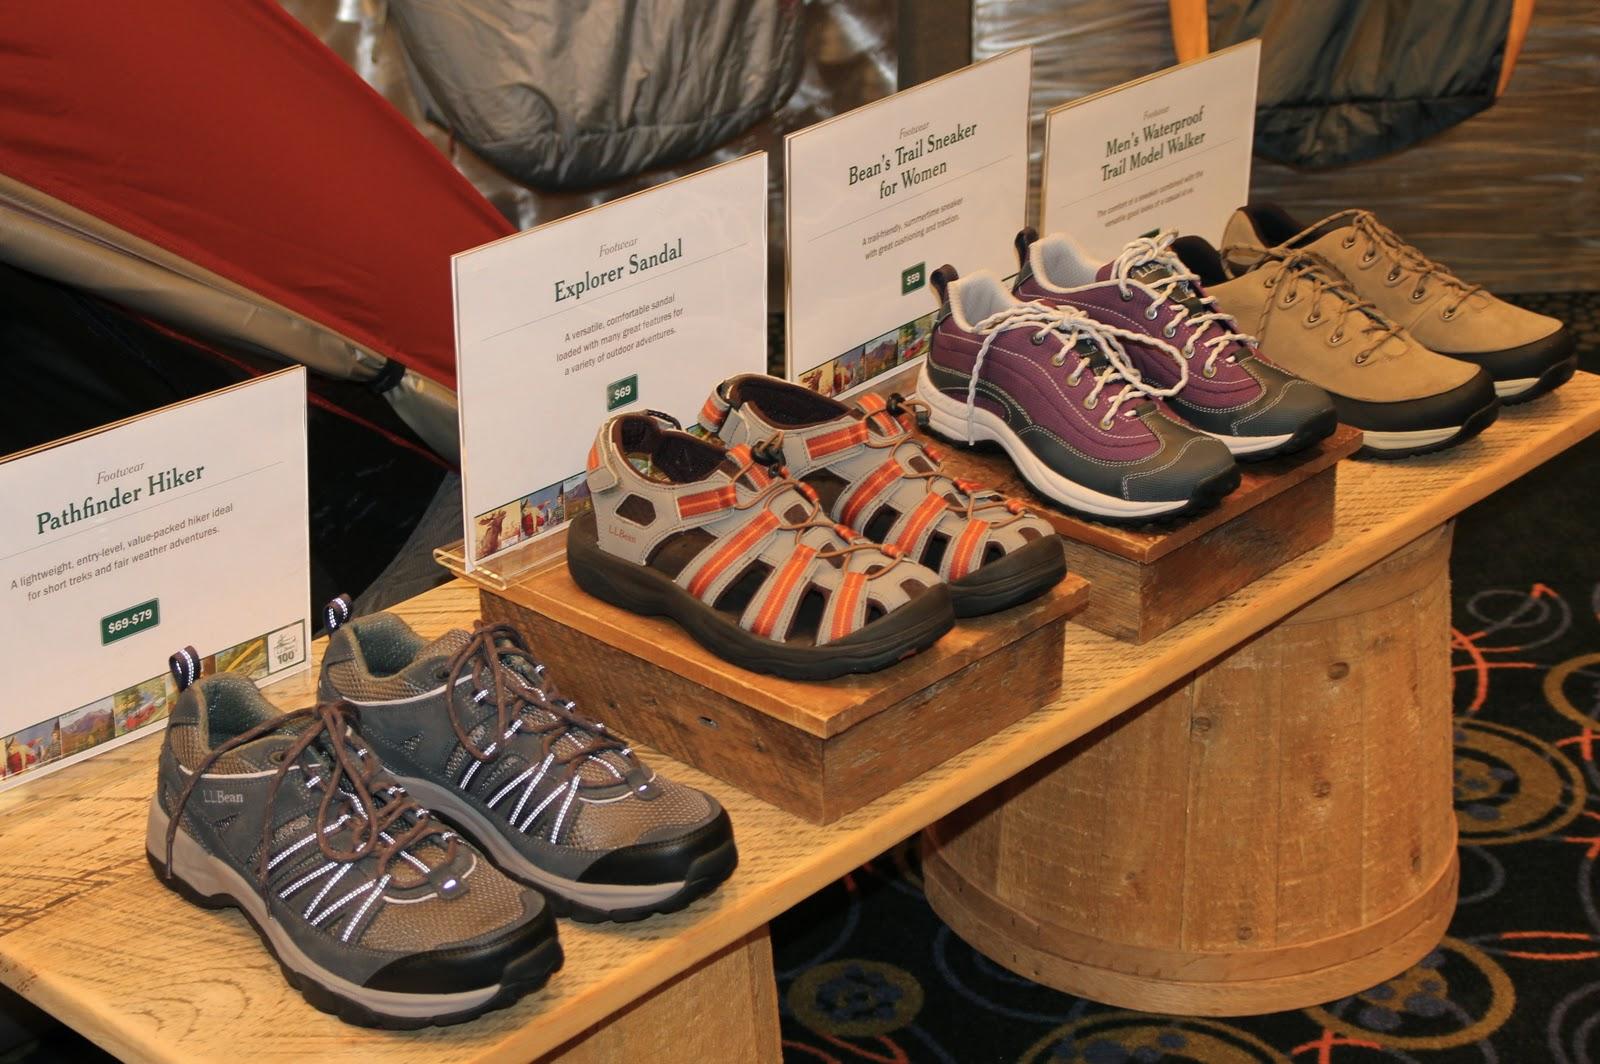 Assorted outdoor ready footwear-lightweight and supportive=-Pathfinder  Hiker $69-$79, Explorer Sandal $69, Trail Sneaker $59 women's.